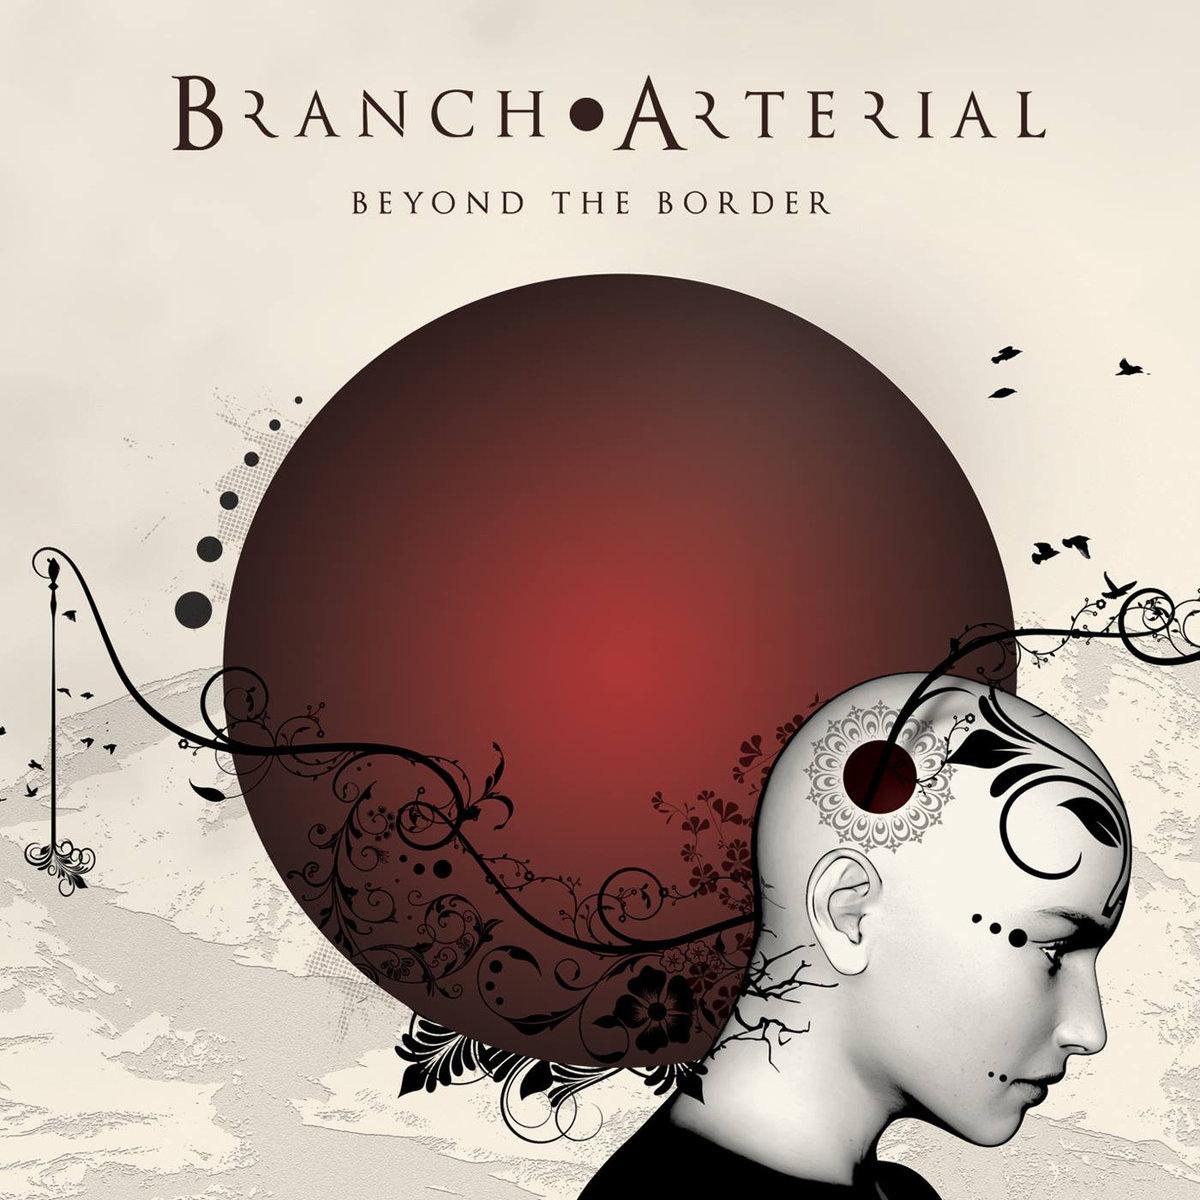 Branch Arterial